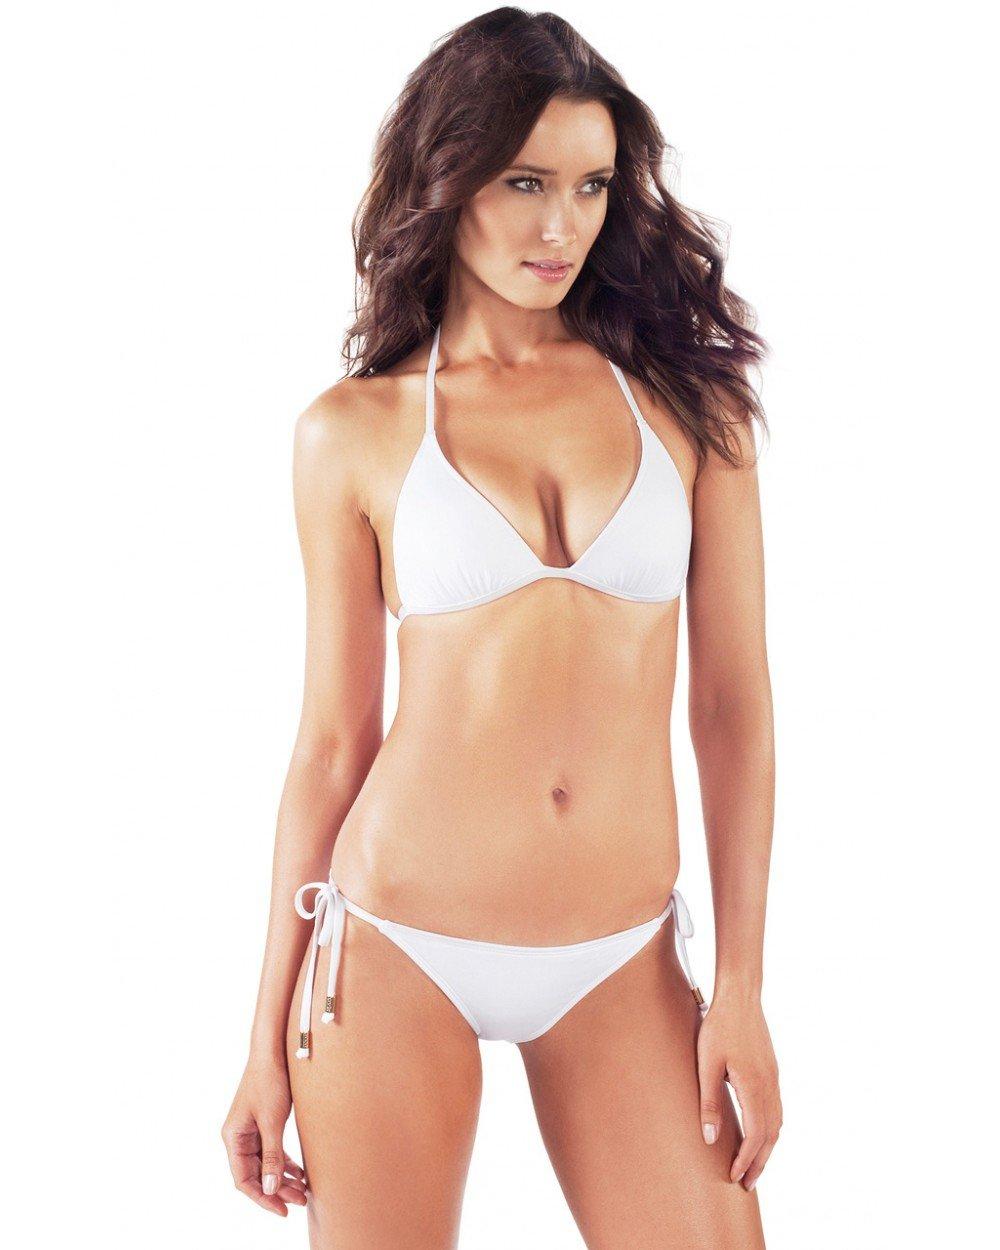 Voda Swim Women's Brazilian Cut String Bikini Bottom S White